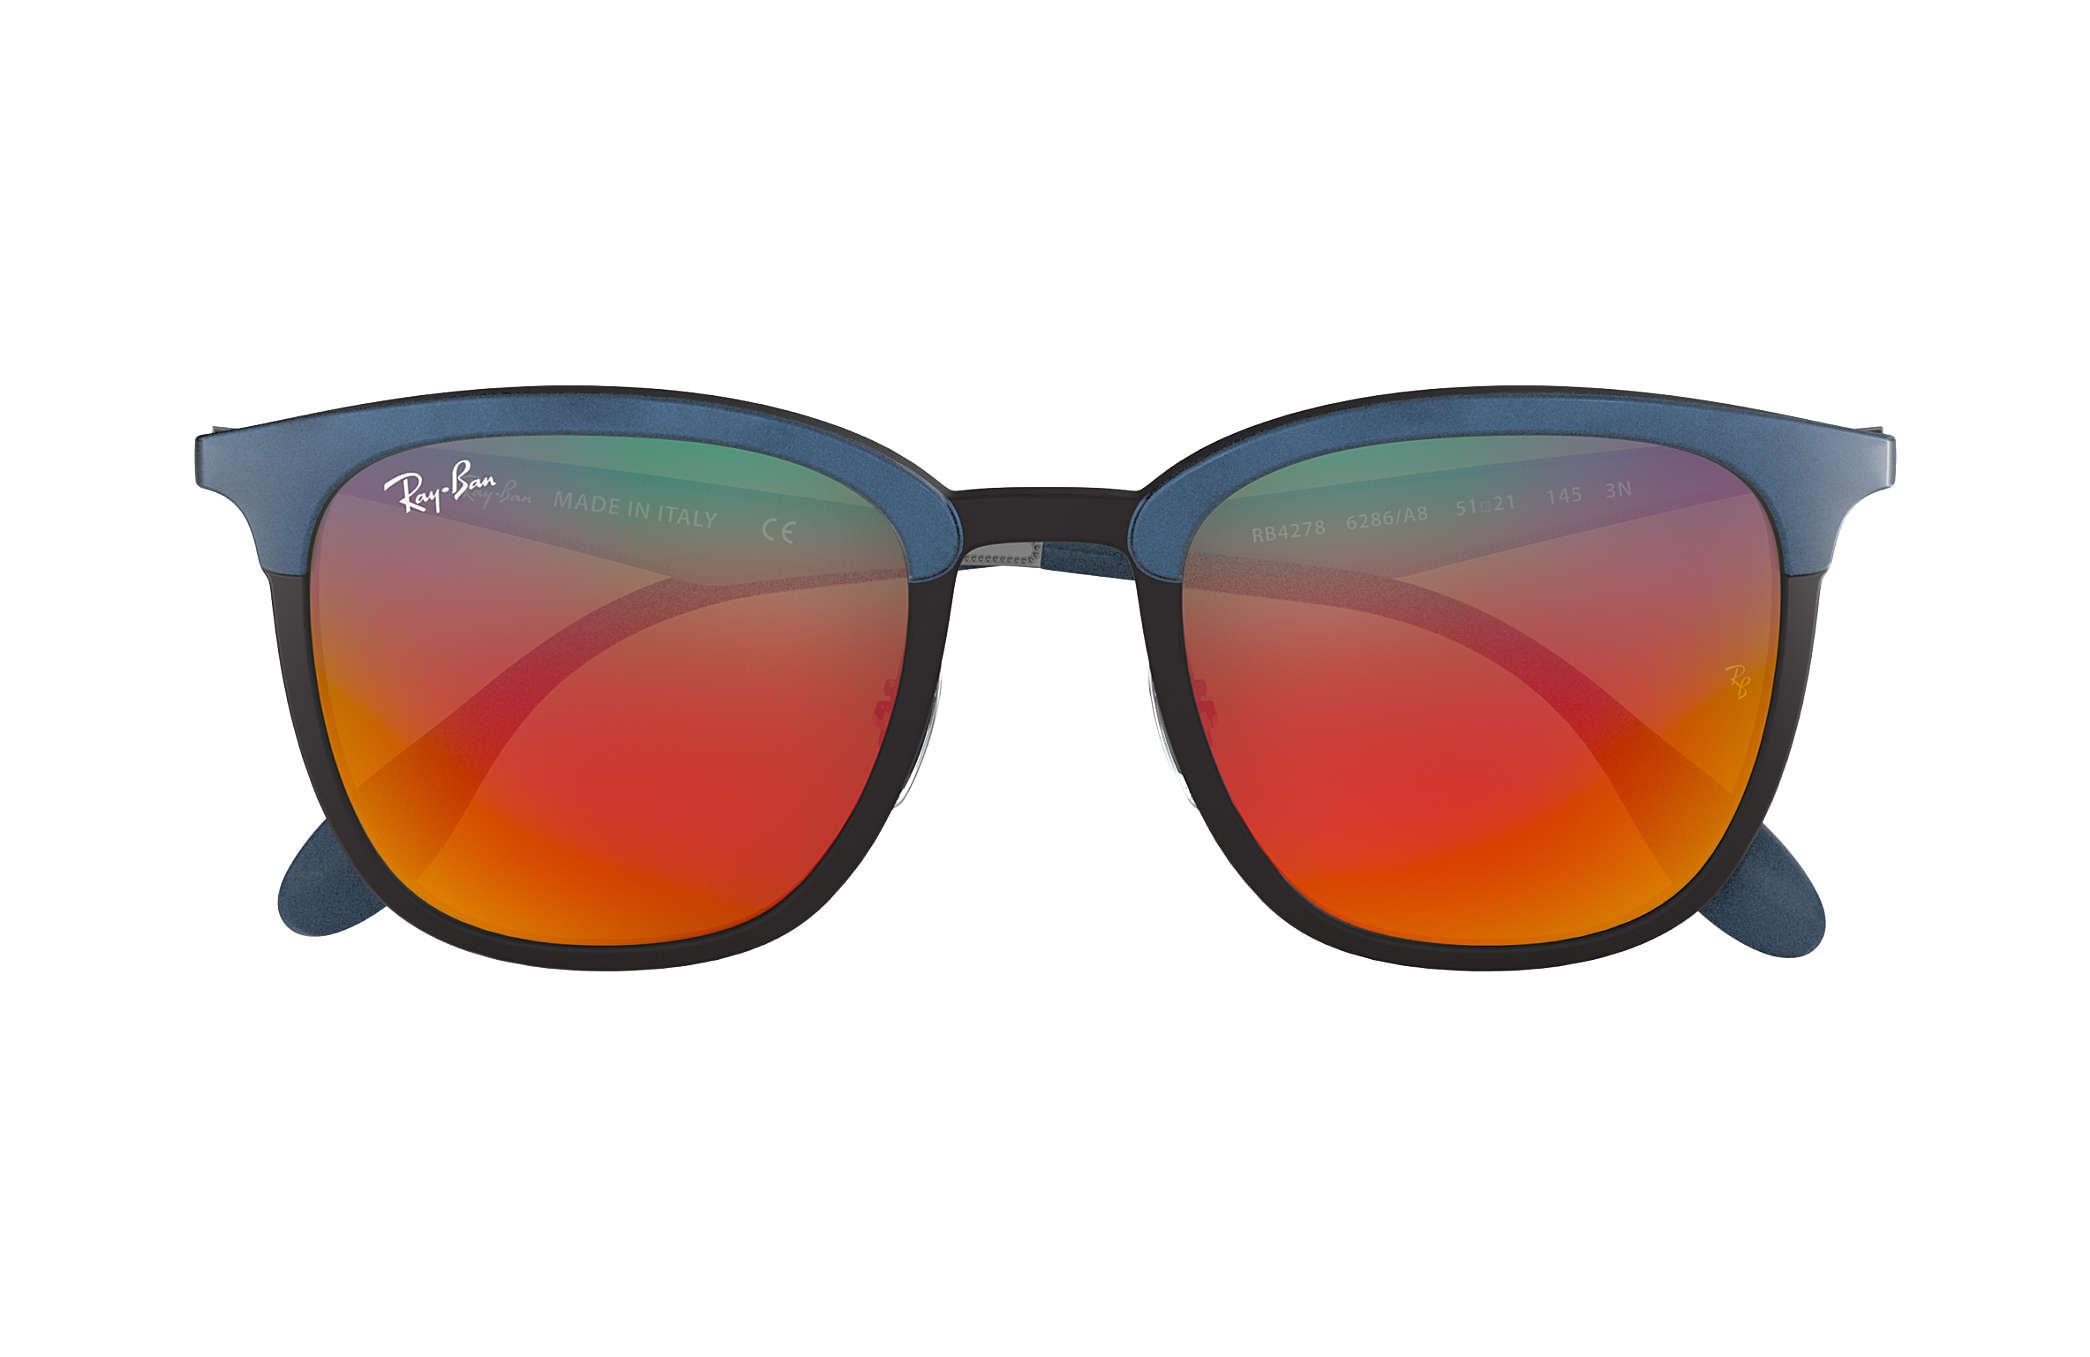 8ca0c6ebff2 Ray-Ban RB4278 Black - Injected - Orange Lenses - 0RB42786286A851 ...